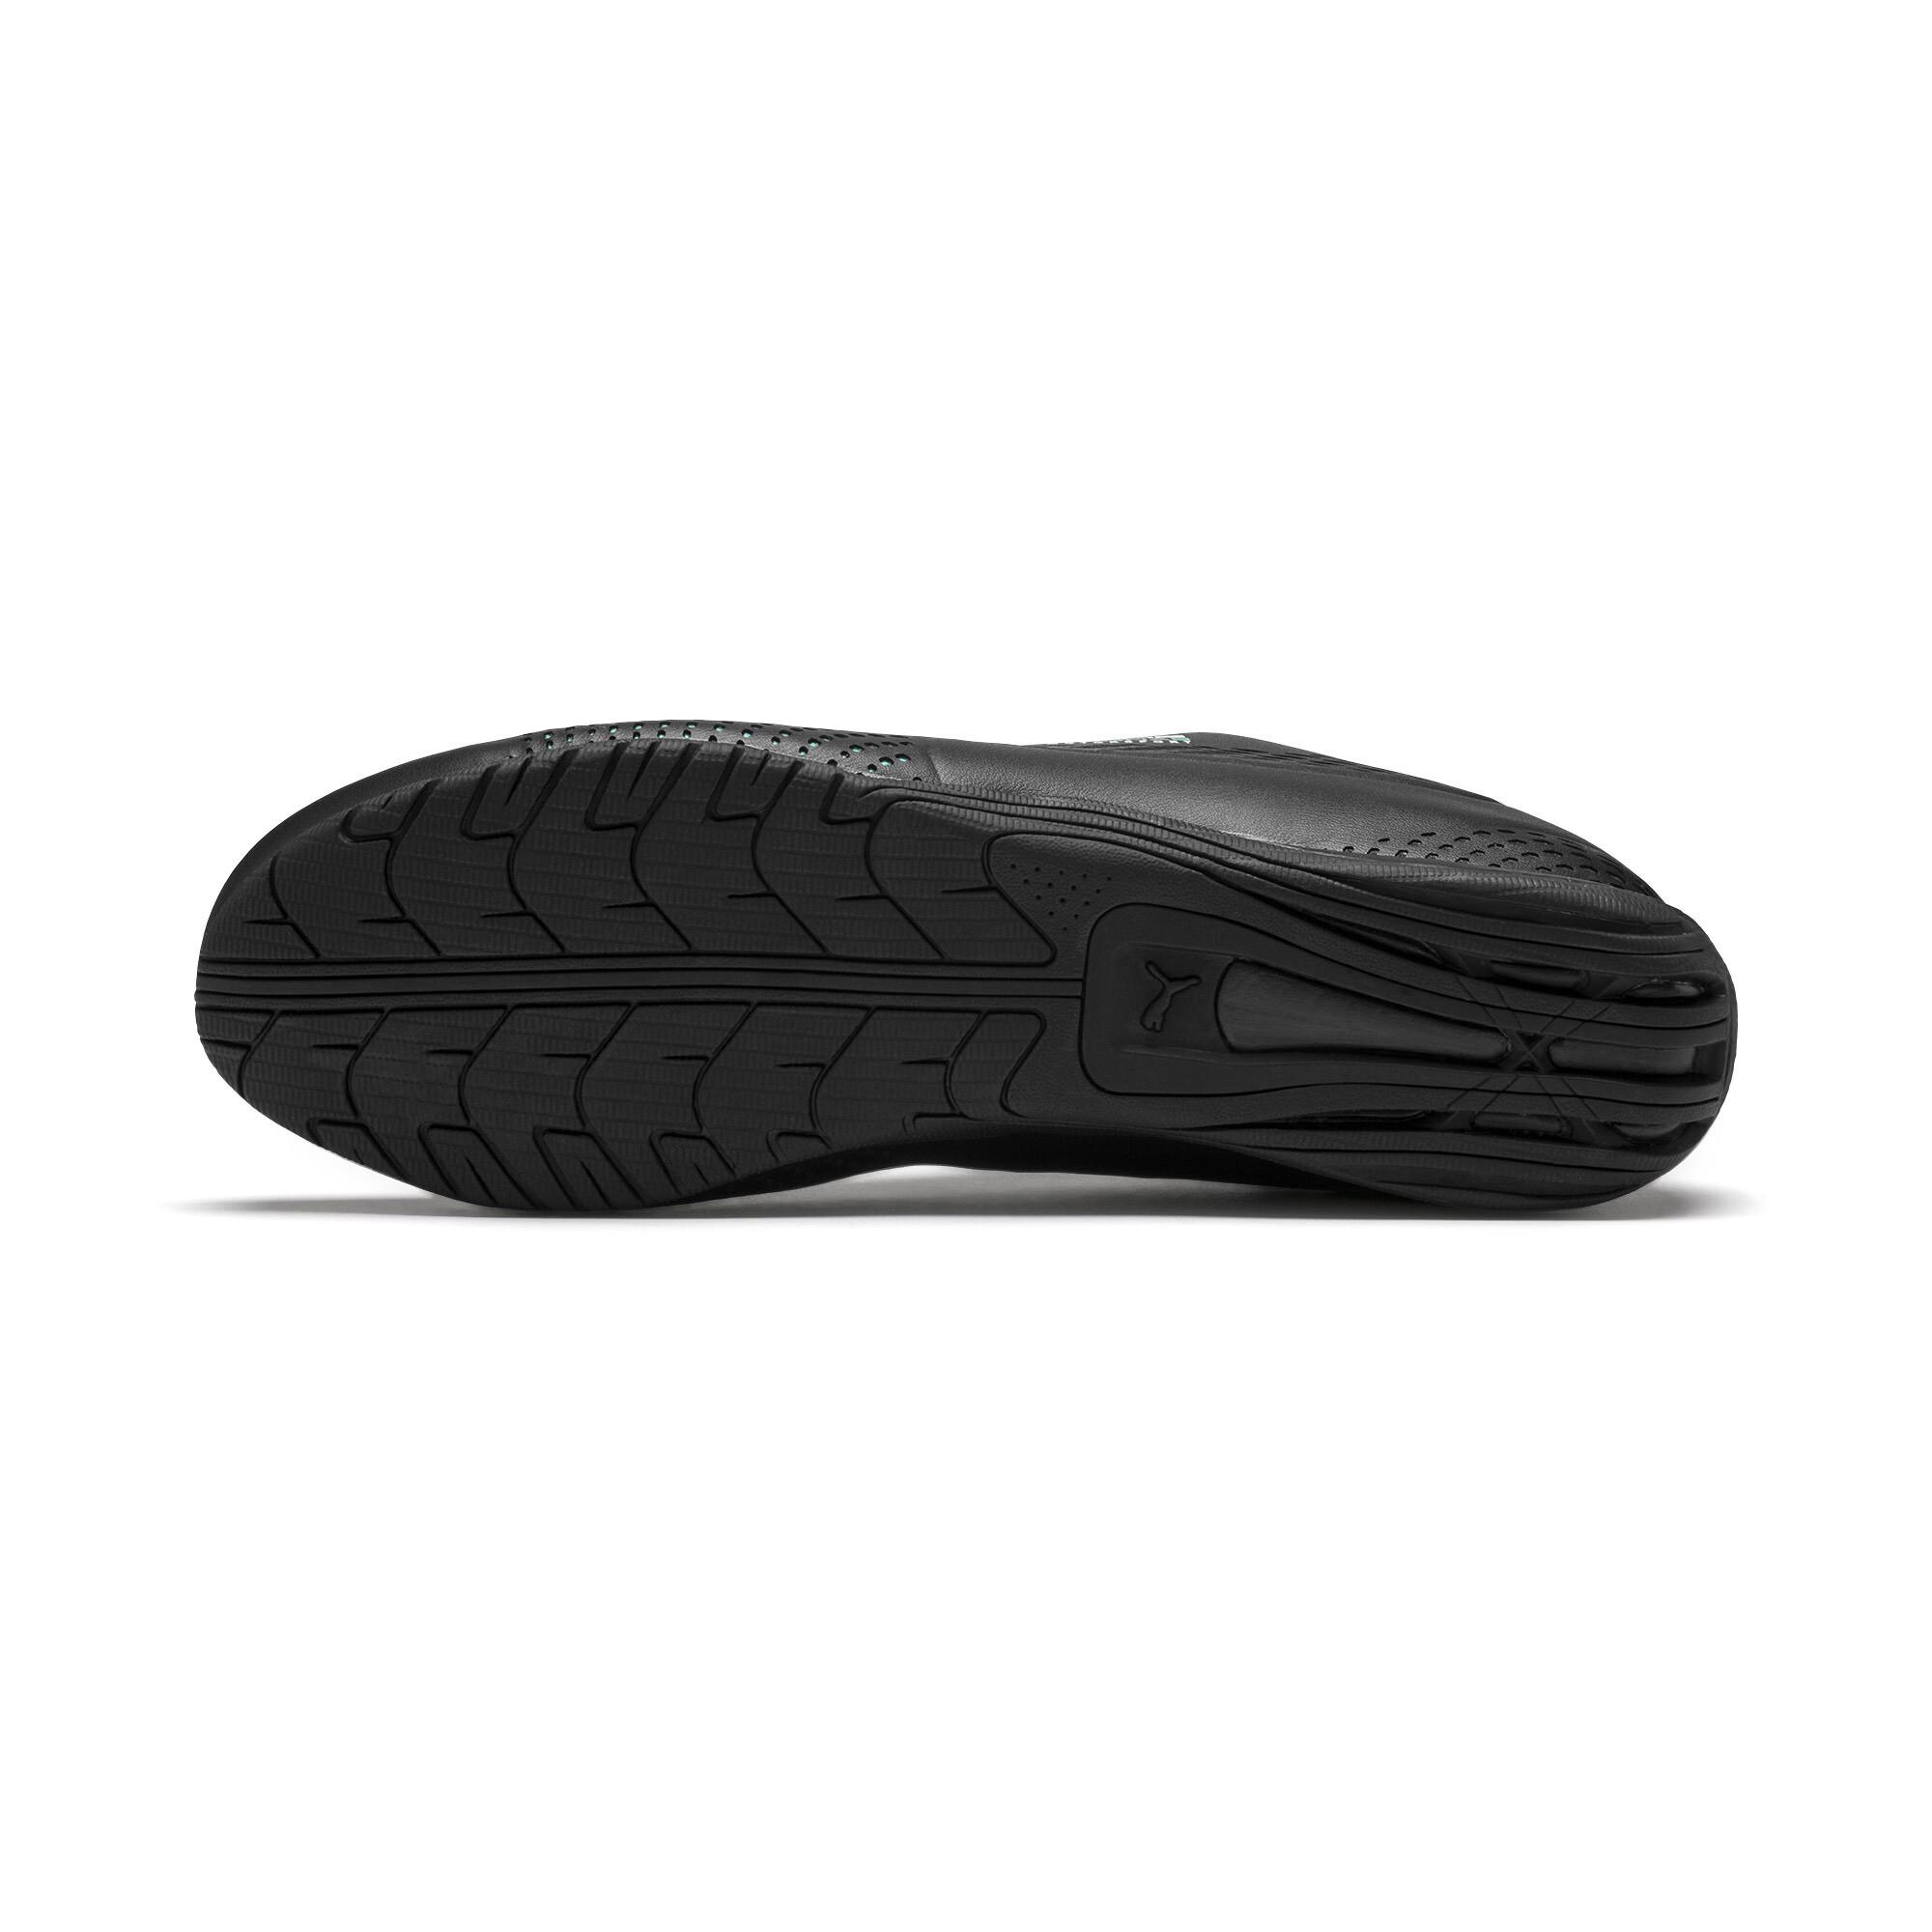 PUMA-Mercedes-AMG-Petronas-Drift-Cat-5-Ultra-II-Sneaker-Unisex-Schuhe-Neu Indexbild 16